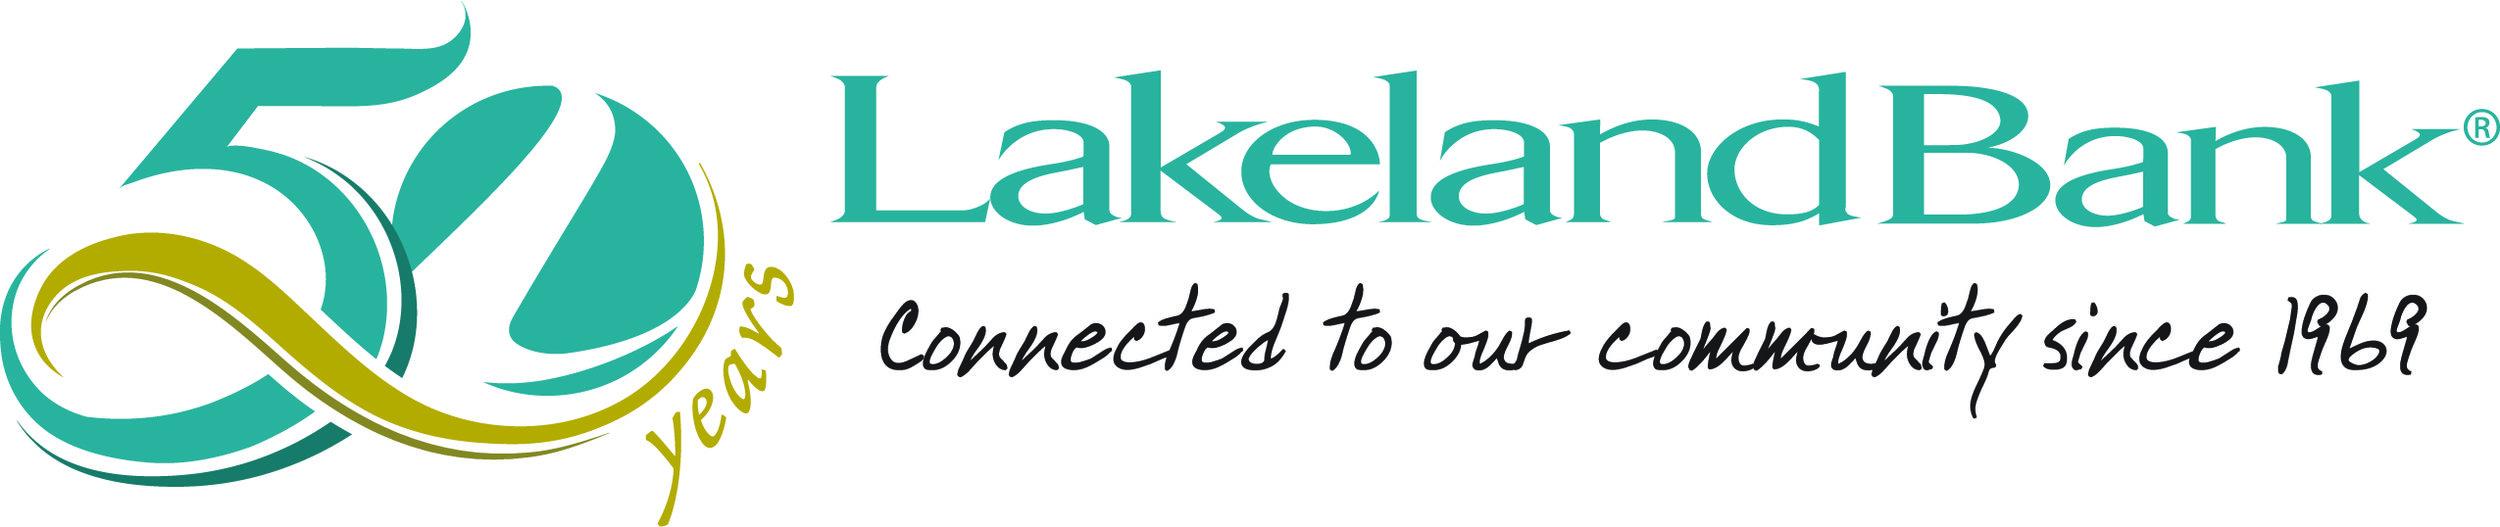 Lakeland-Bank-50th-Anniversary-Logo_Horiz_CMYK.jpg